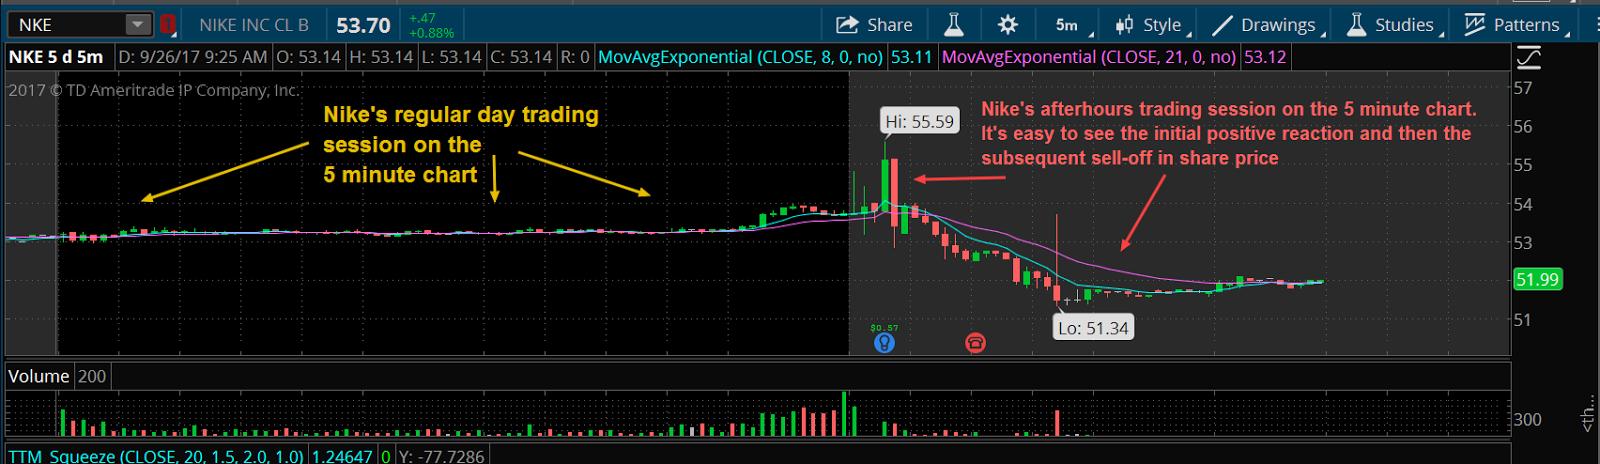 Nike Inc Charts